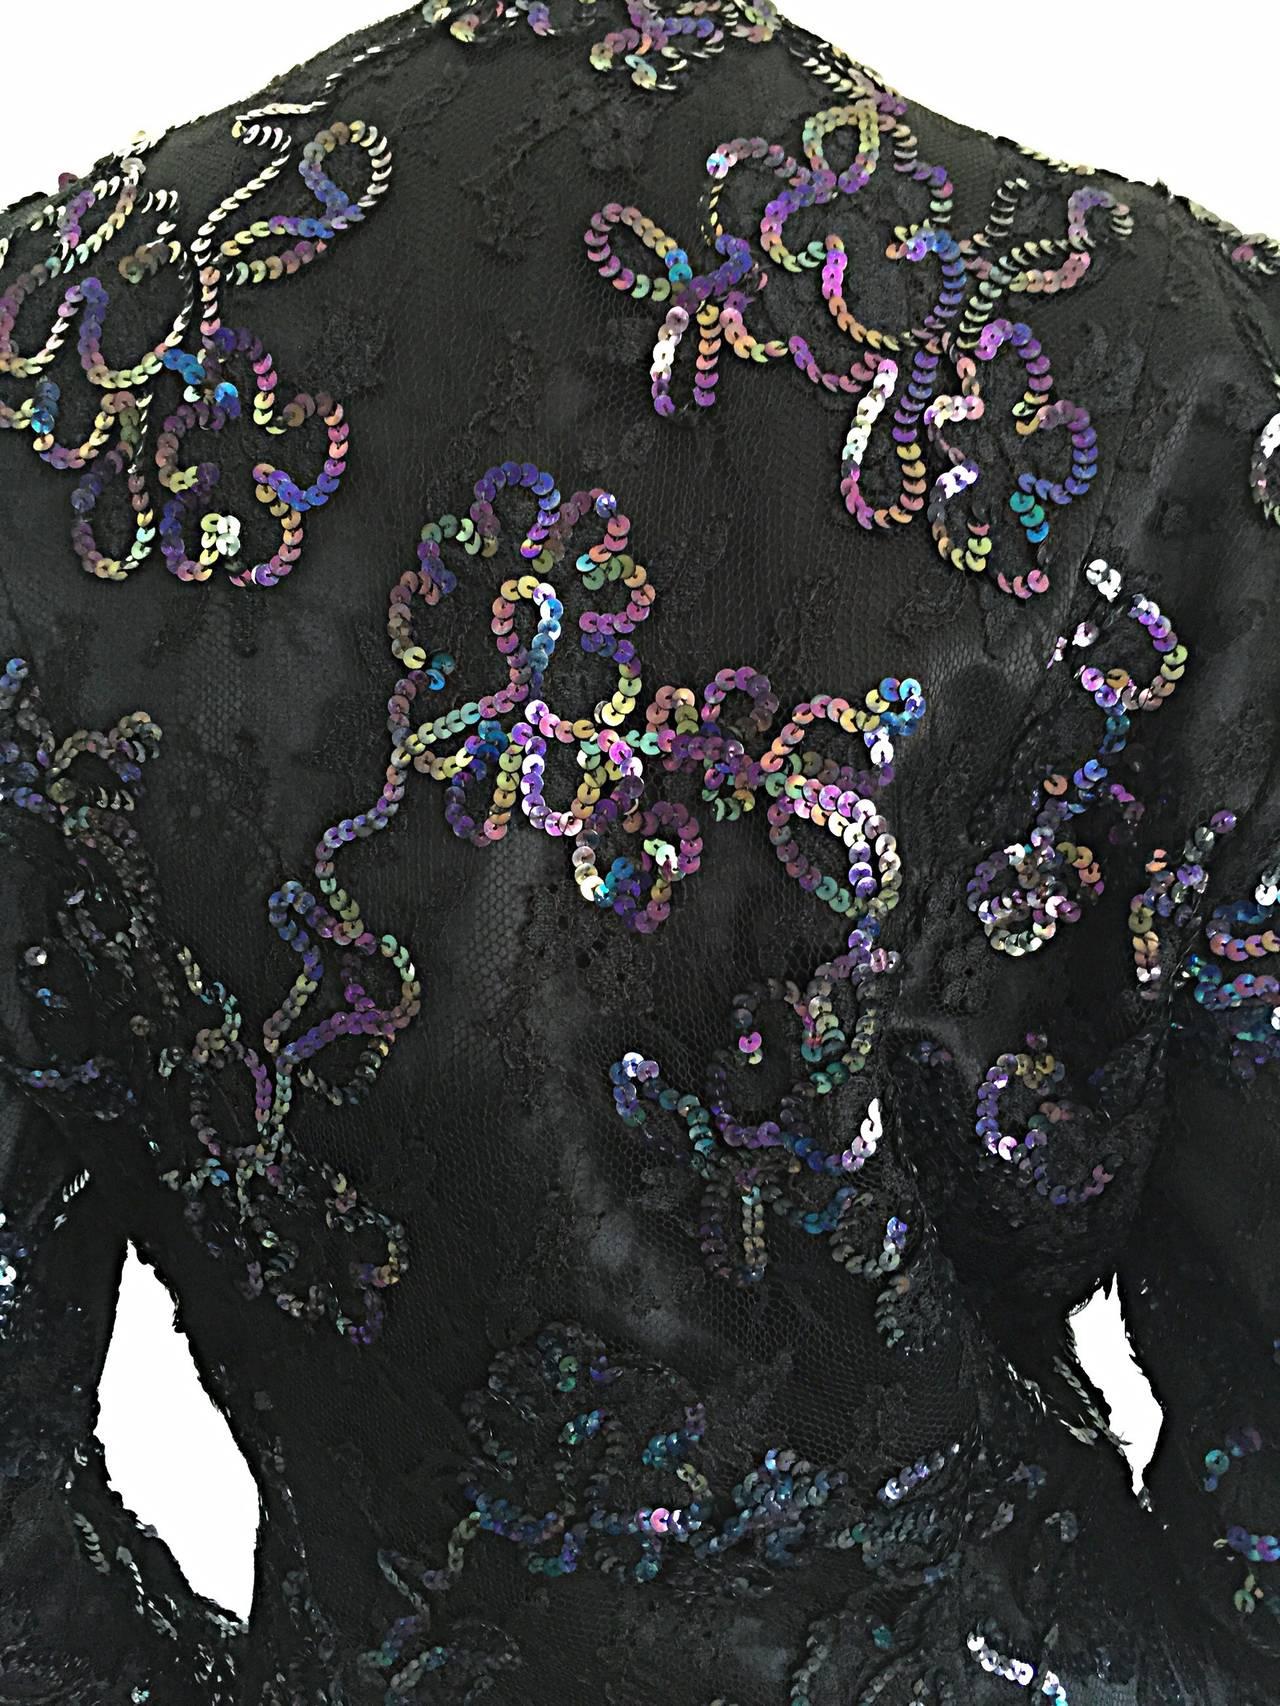 Women's Beautiful Vintage Joanna Mastroianni Sequins and Lace Black Blazer Jacket For Sale